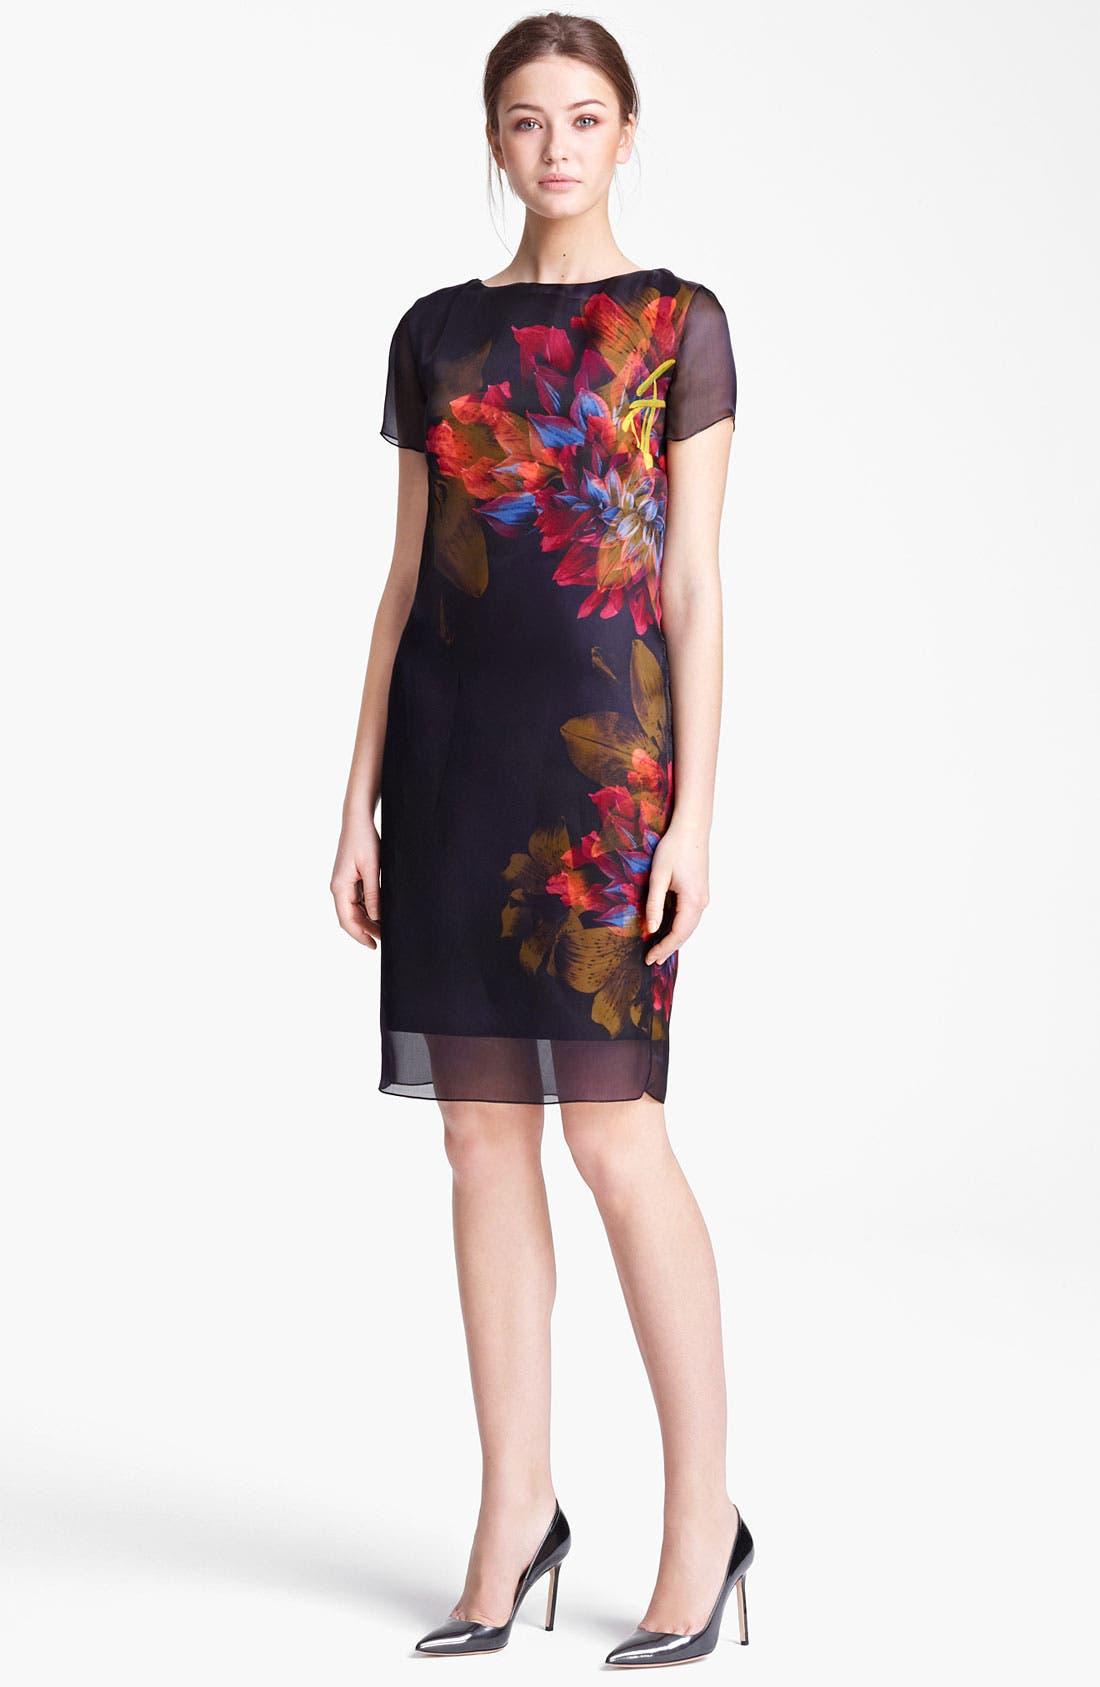 Alternate Image 1 Selected - Max Mara 'Algusto' Print Organza Dress